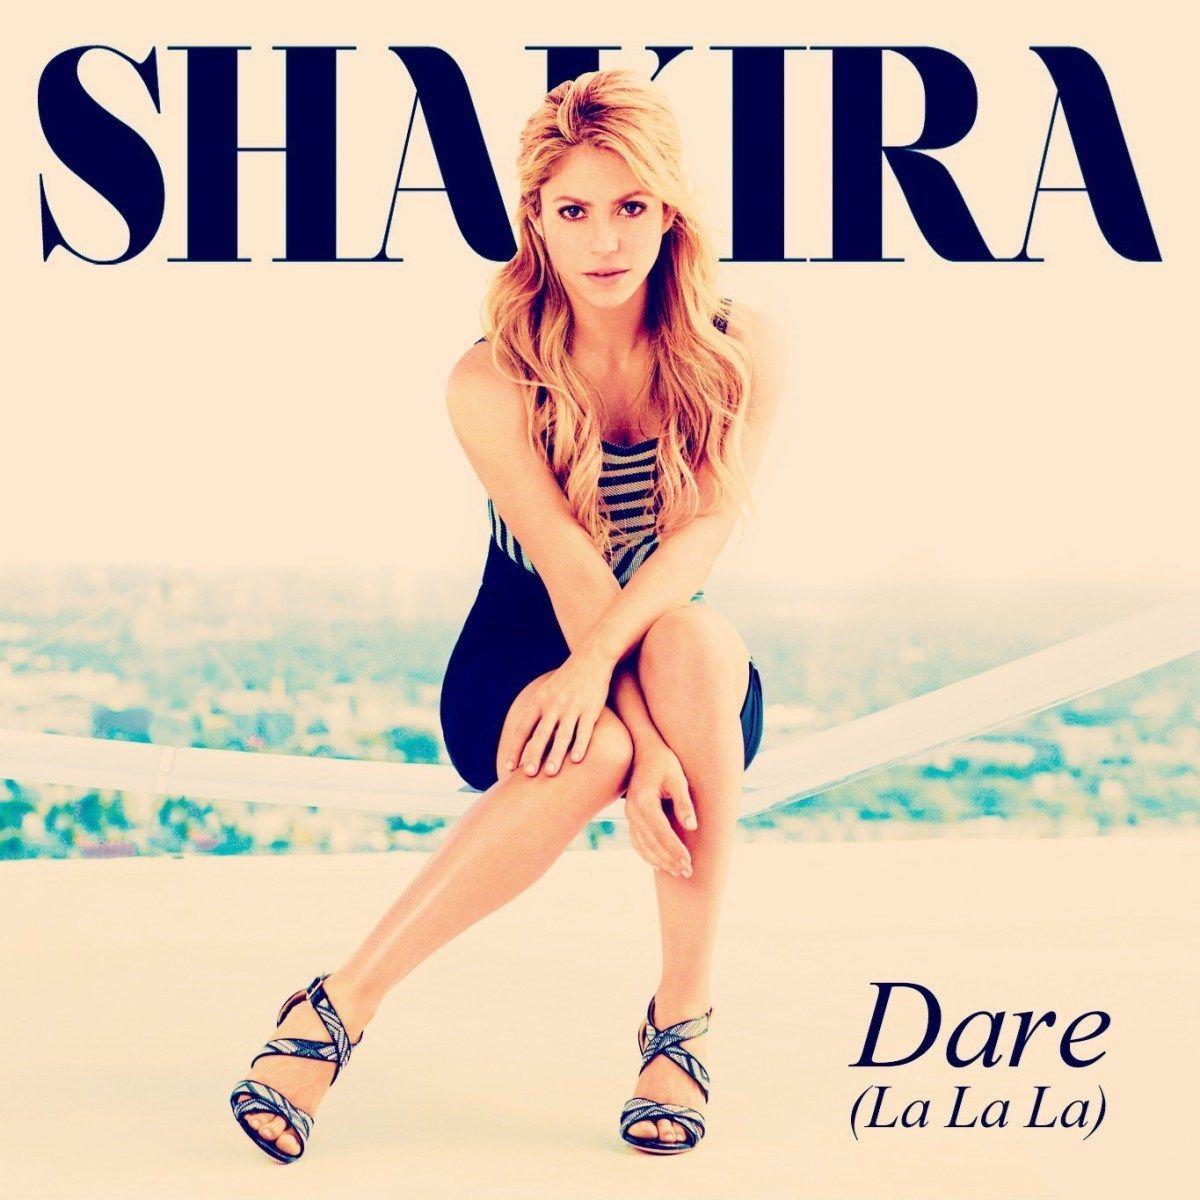 shakira 2014 album download